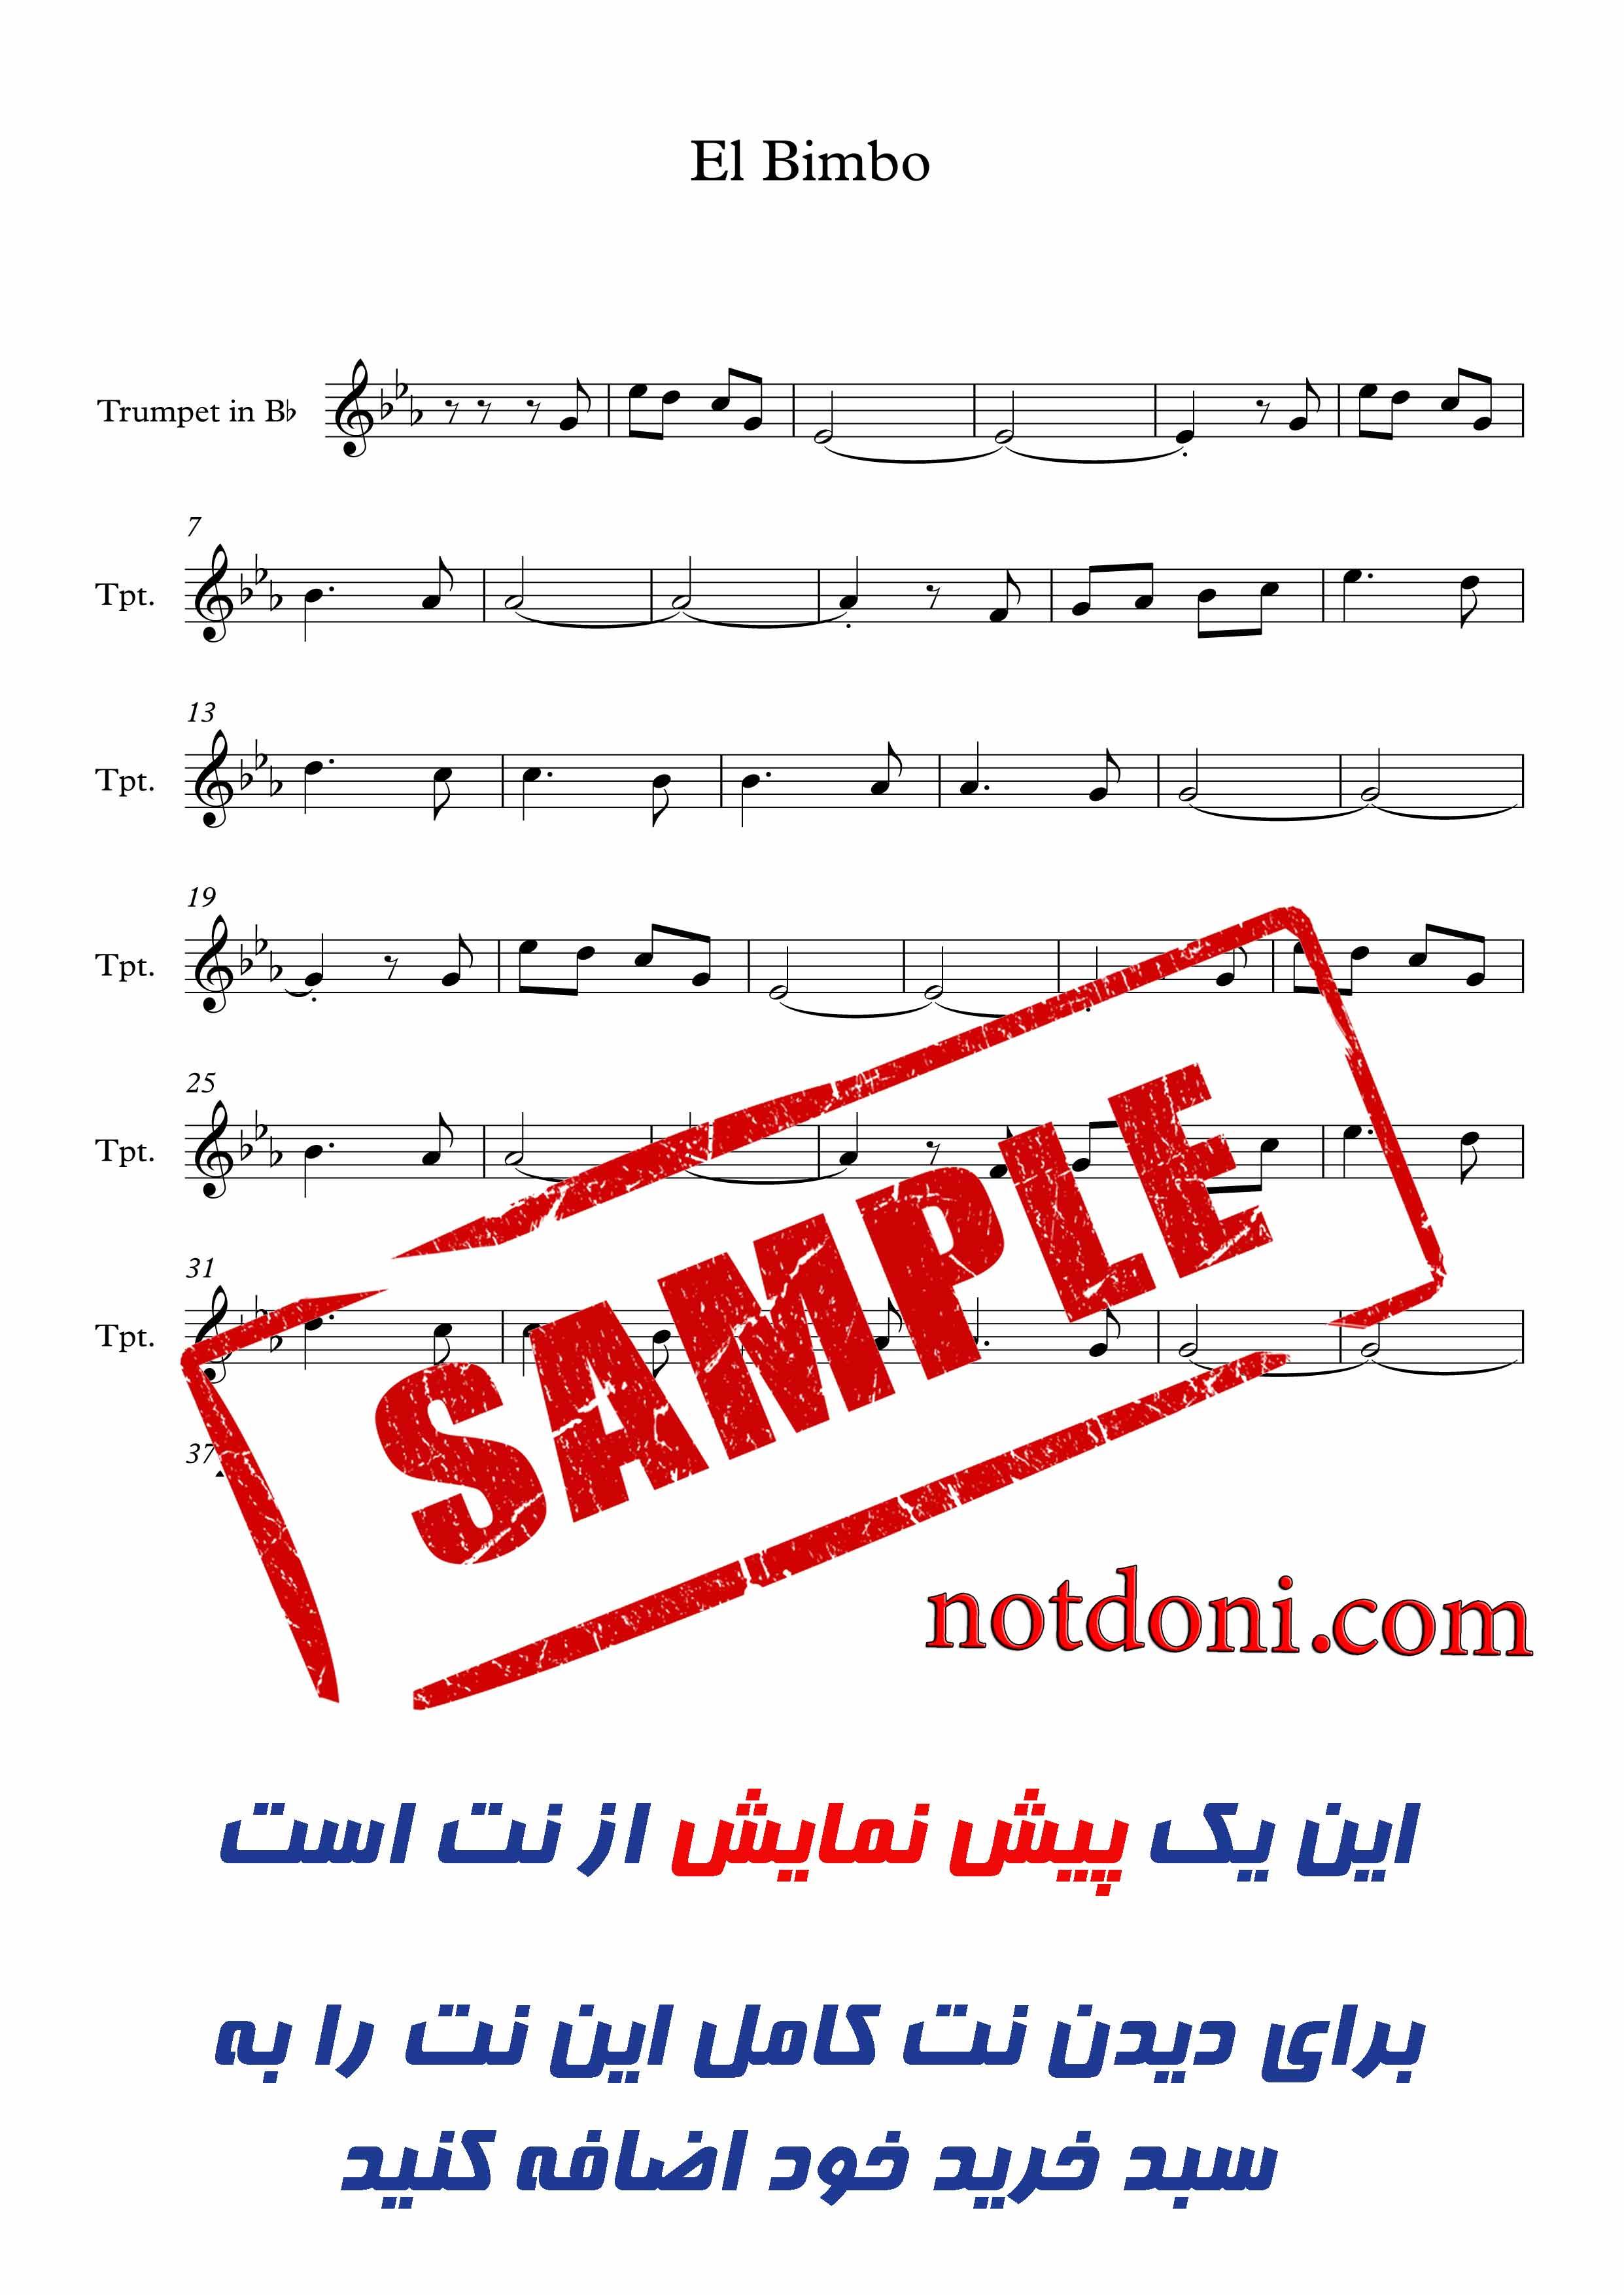 9569d0ee-532b-47c3-94f2-e8de39d4a4f4_نت-آهنگ-ال-بیمیو.jpg